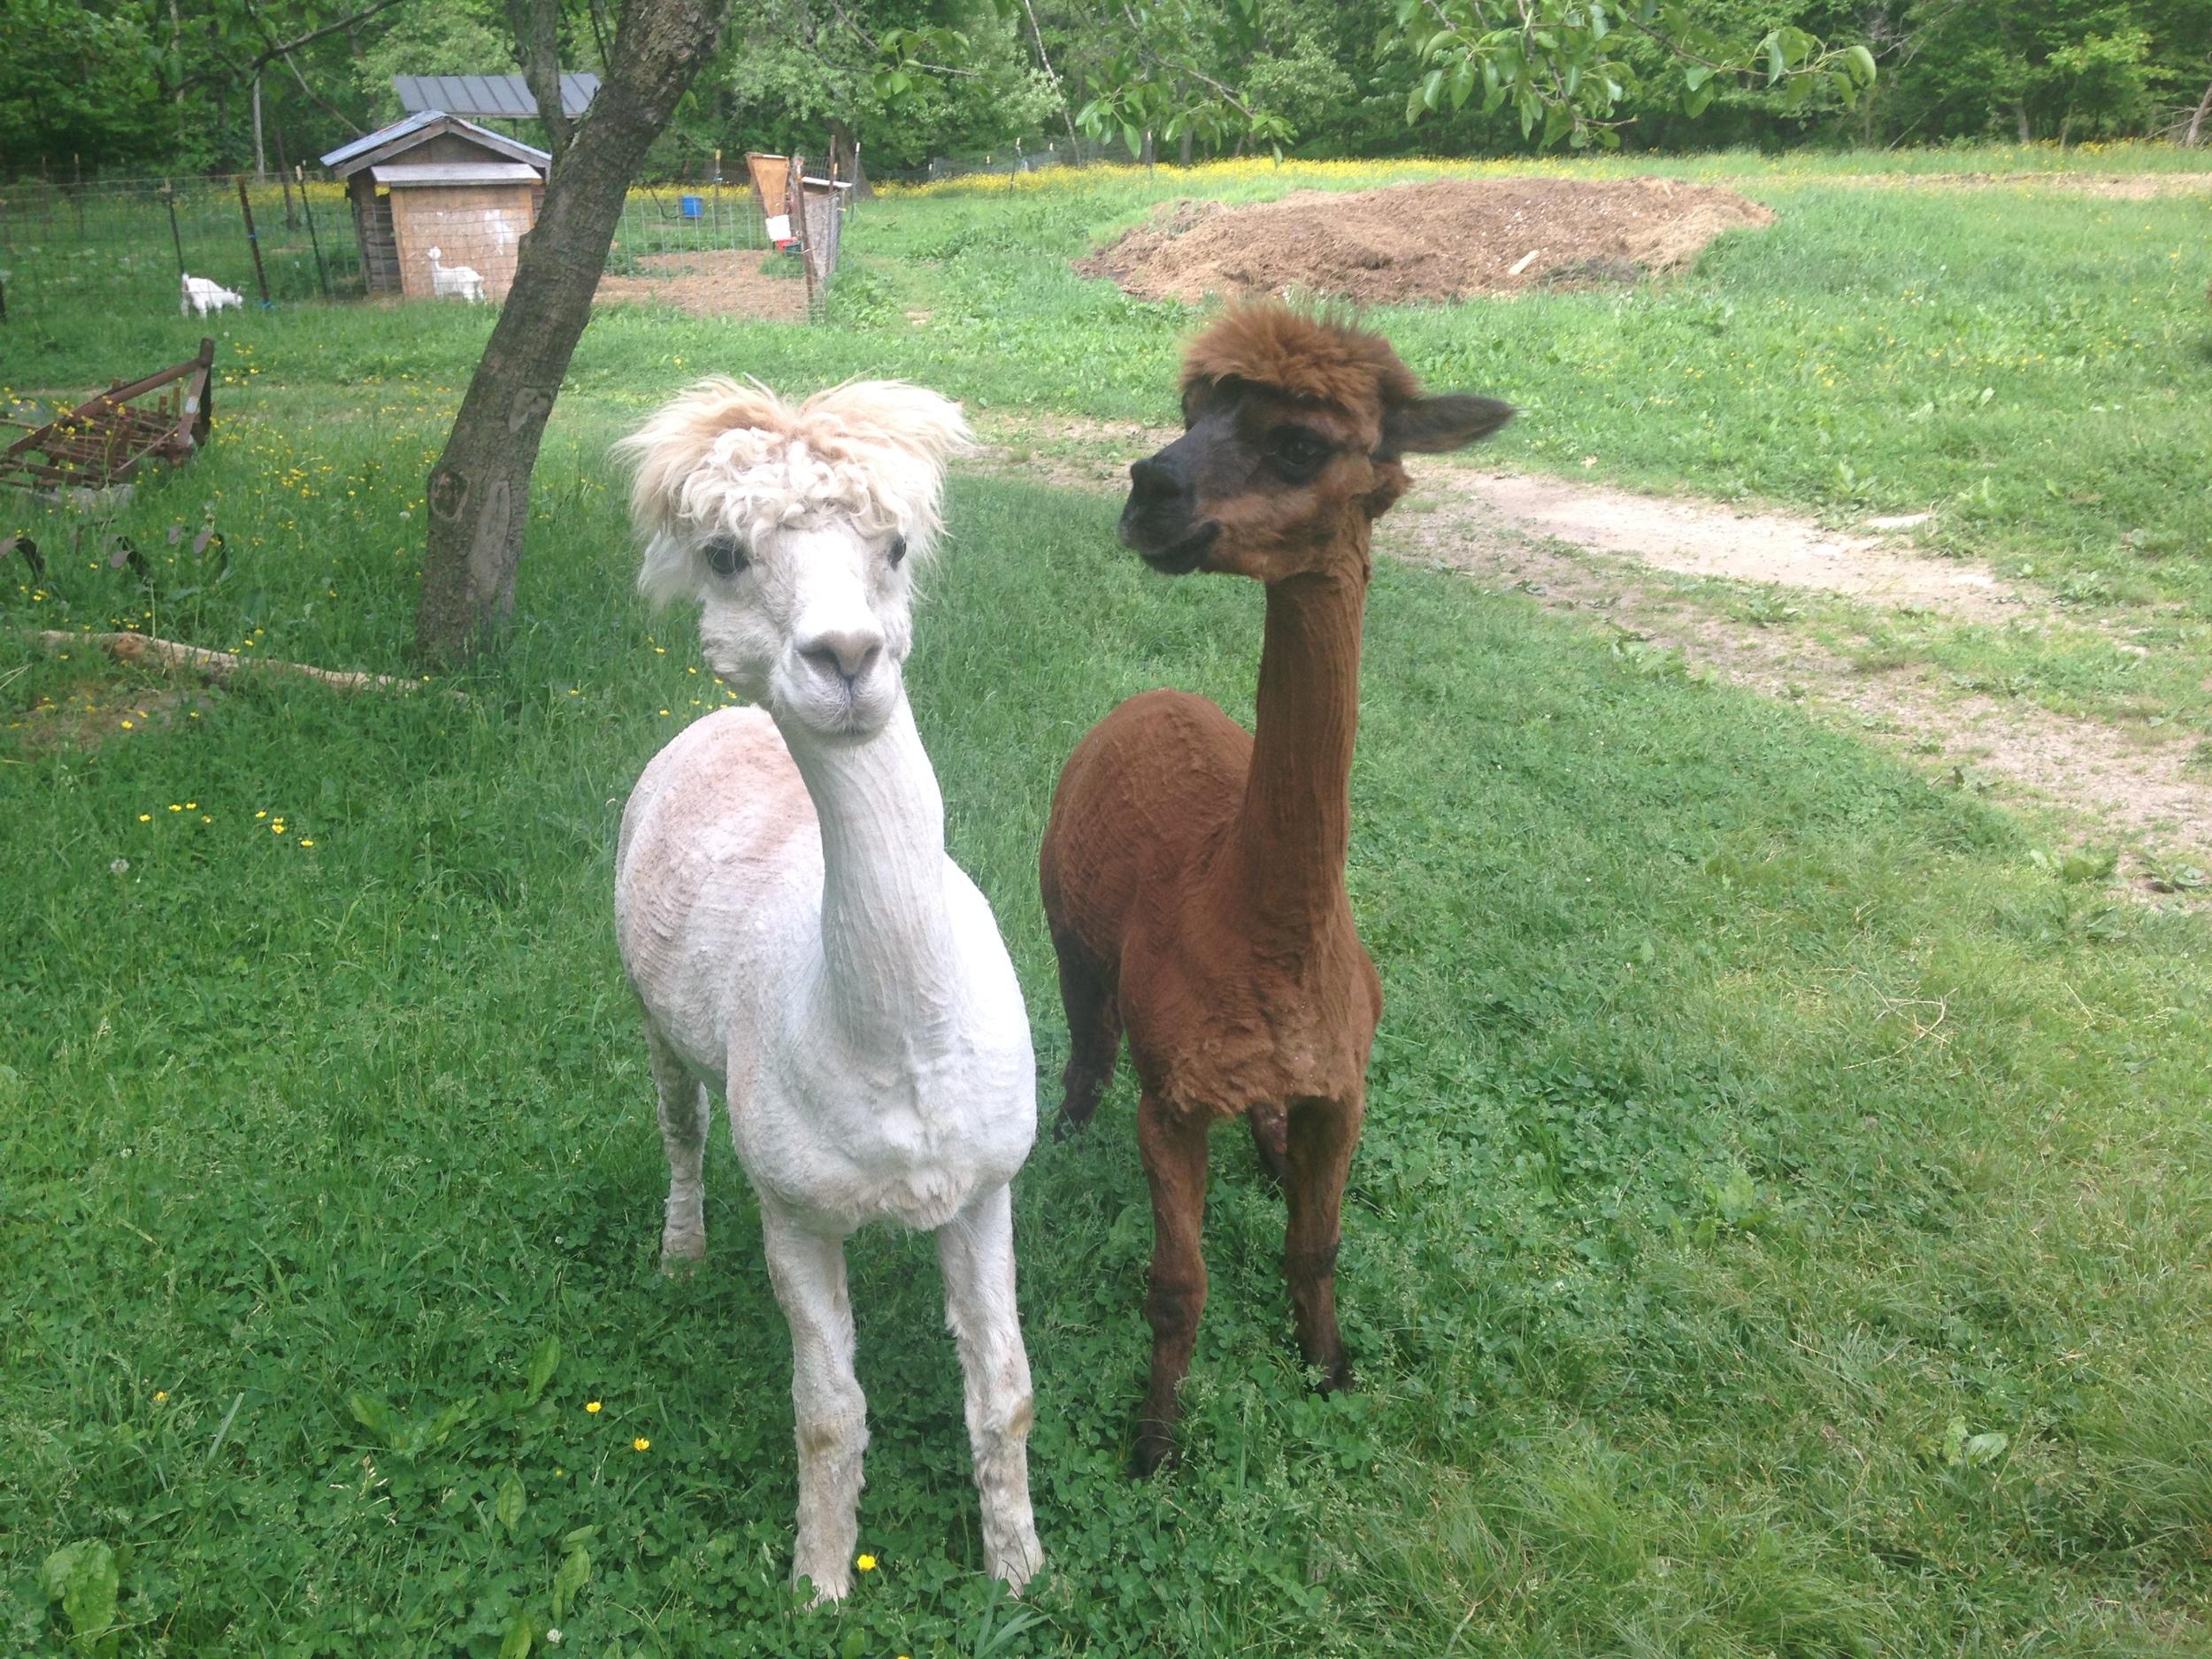 JourneysEndFarm_Alpacas2016-05-28 (15).JPG